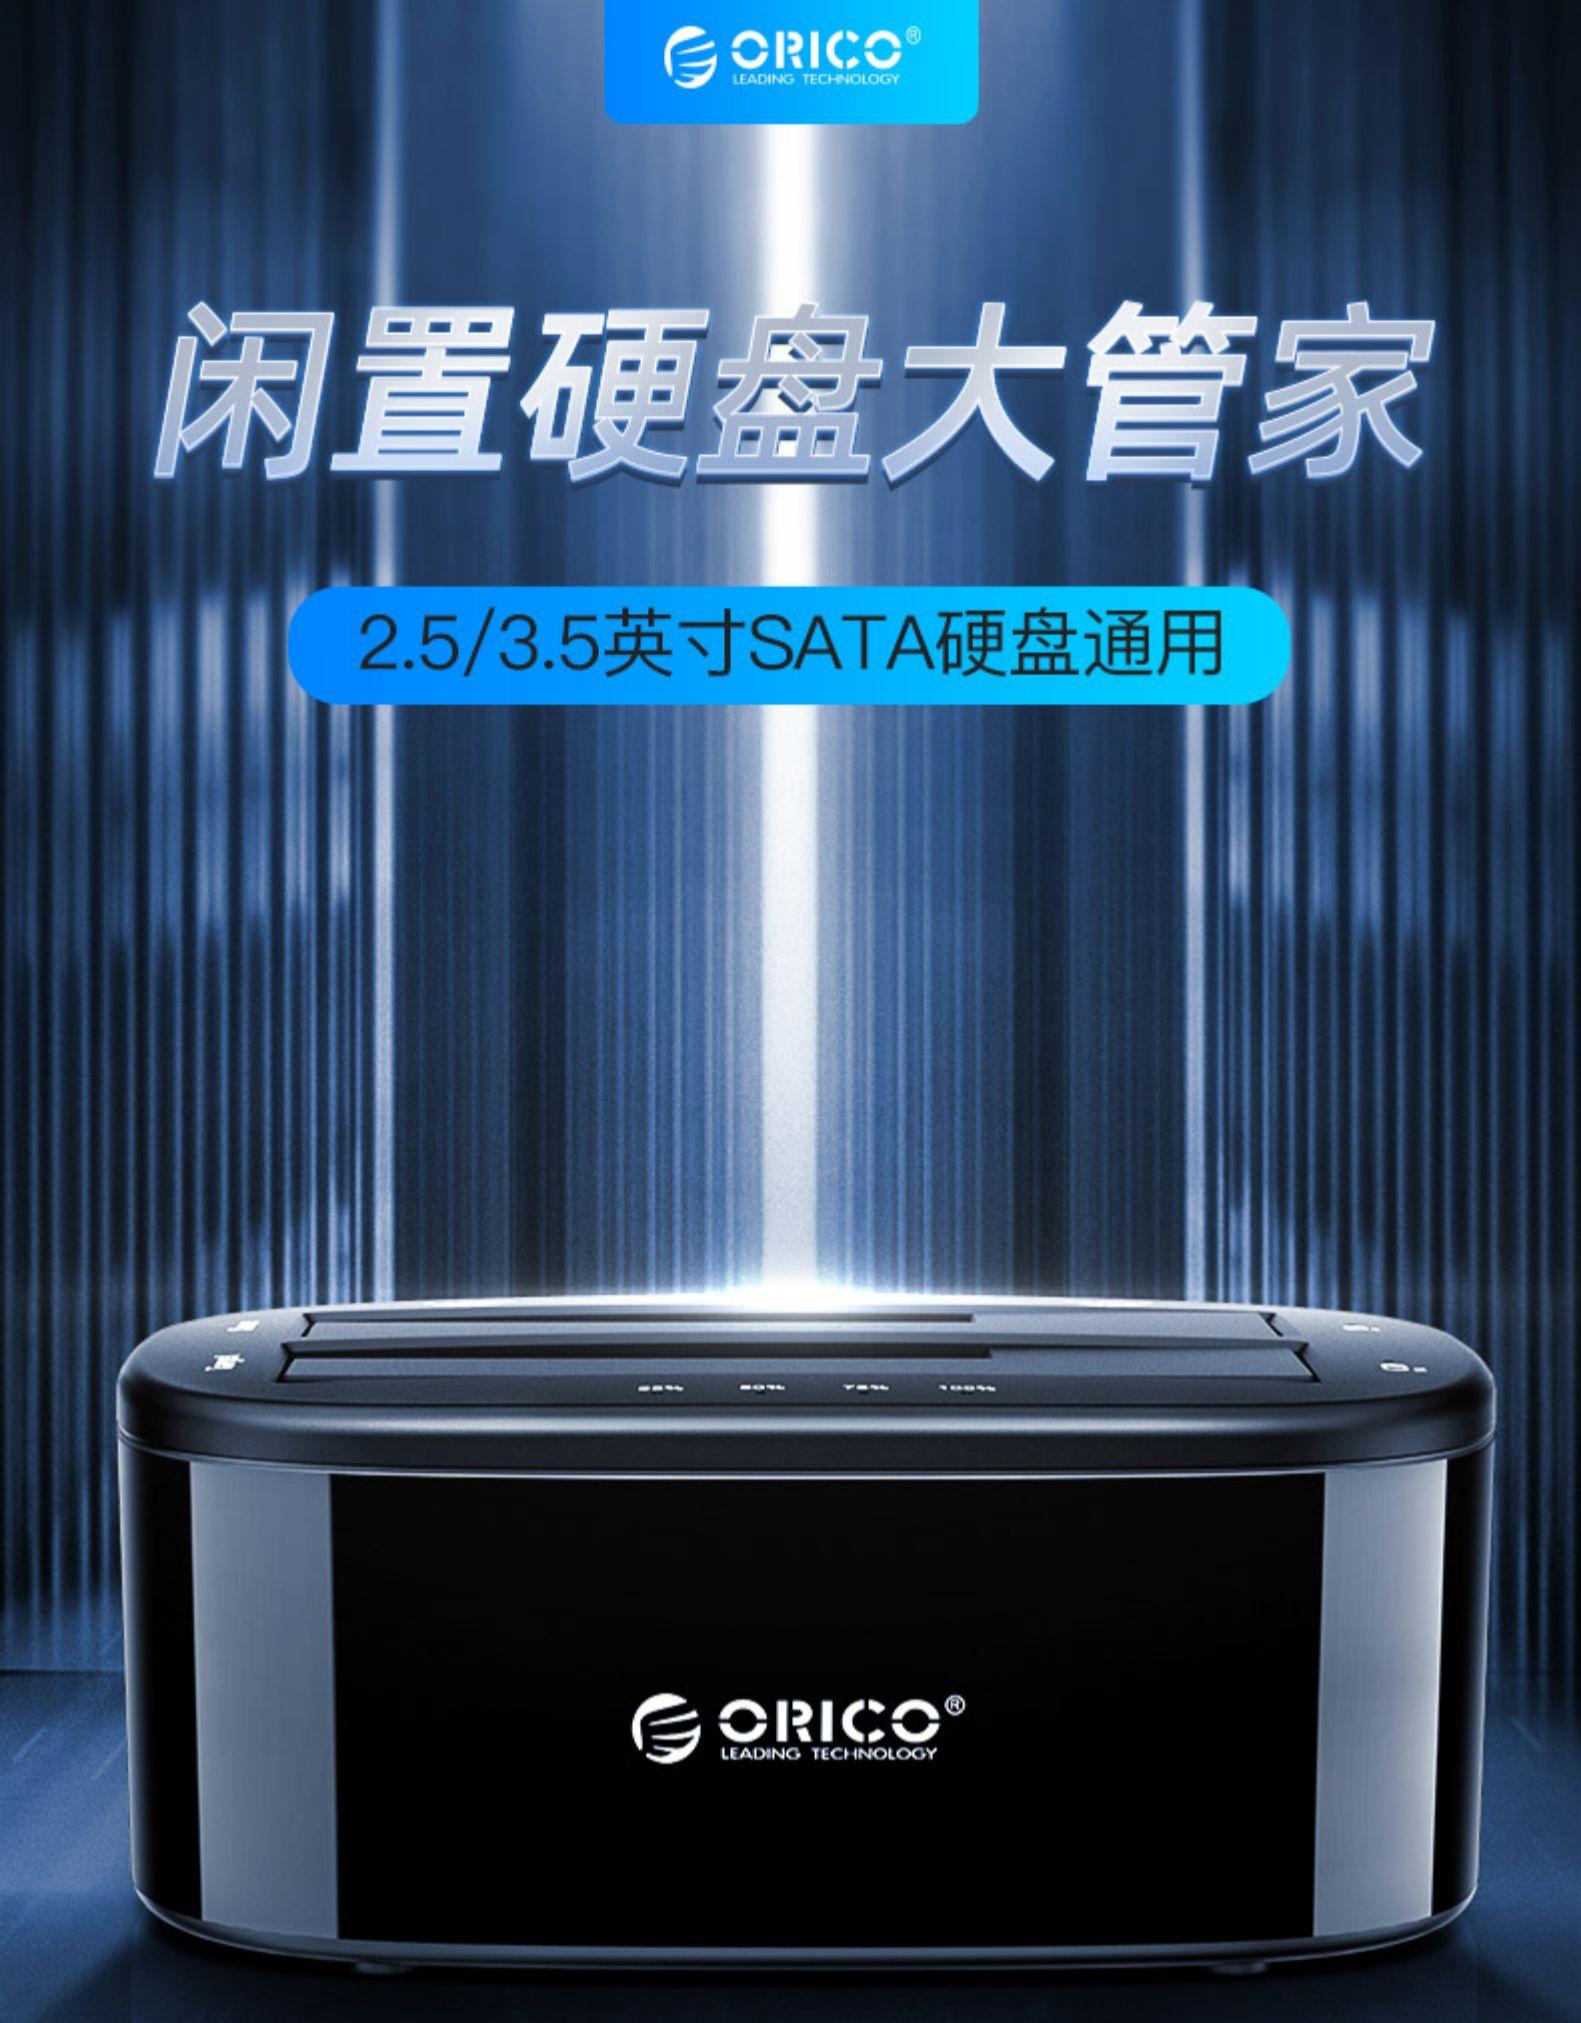 Orico 奥睿科 2.5/3.5英寸USB3.0 SATA硬盘底座 图1